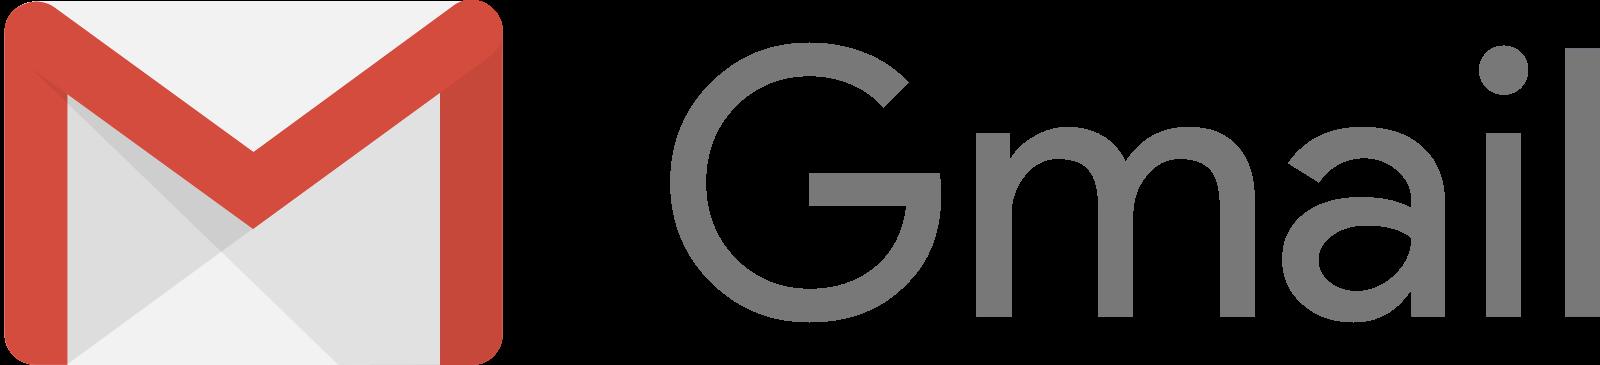 gmail-logo-4